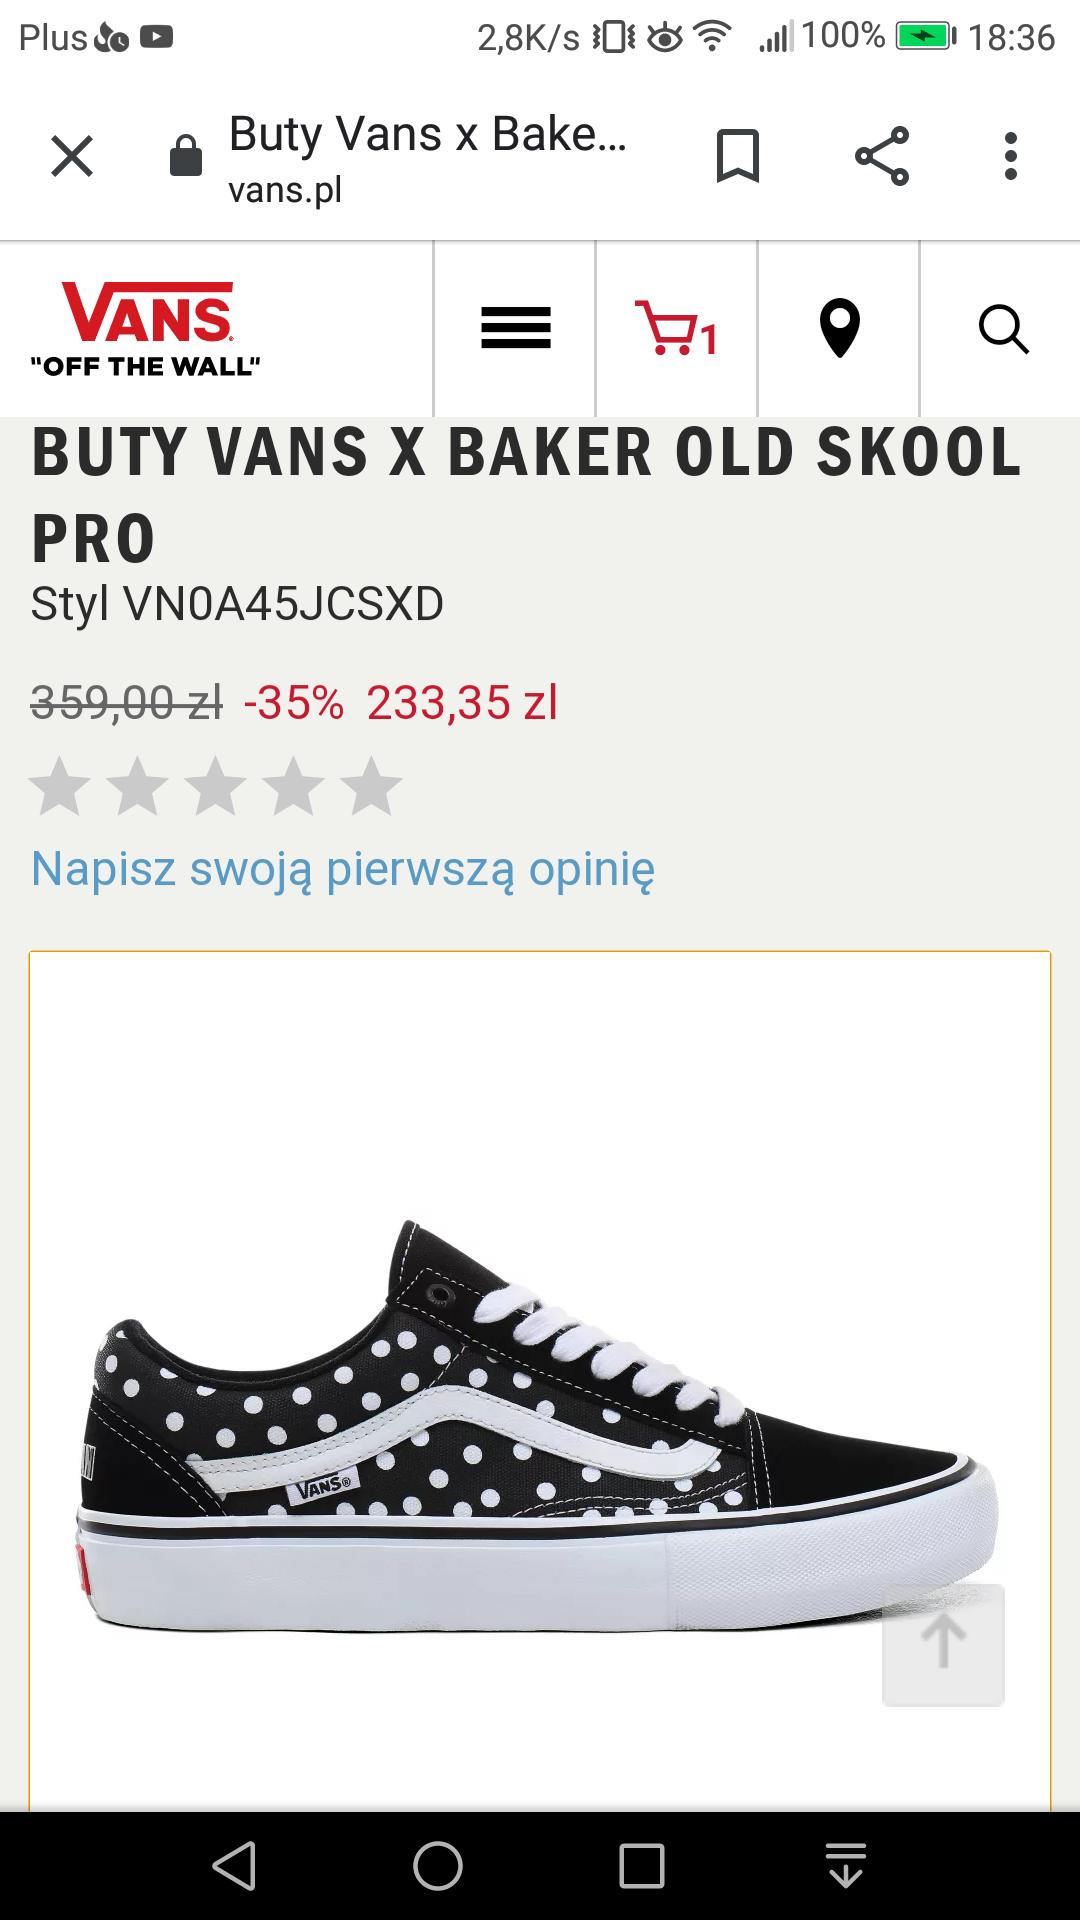 Buty vans x baker old skool pro